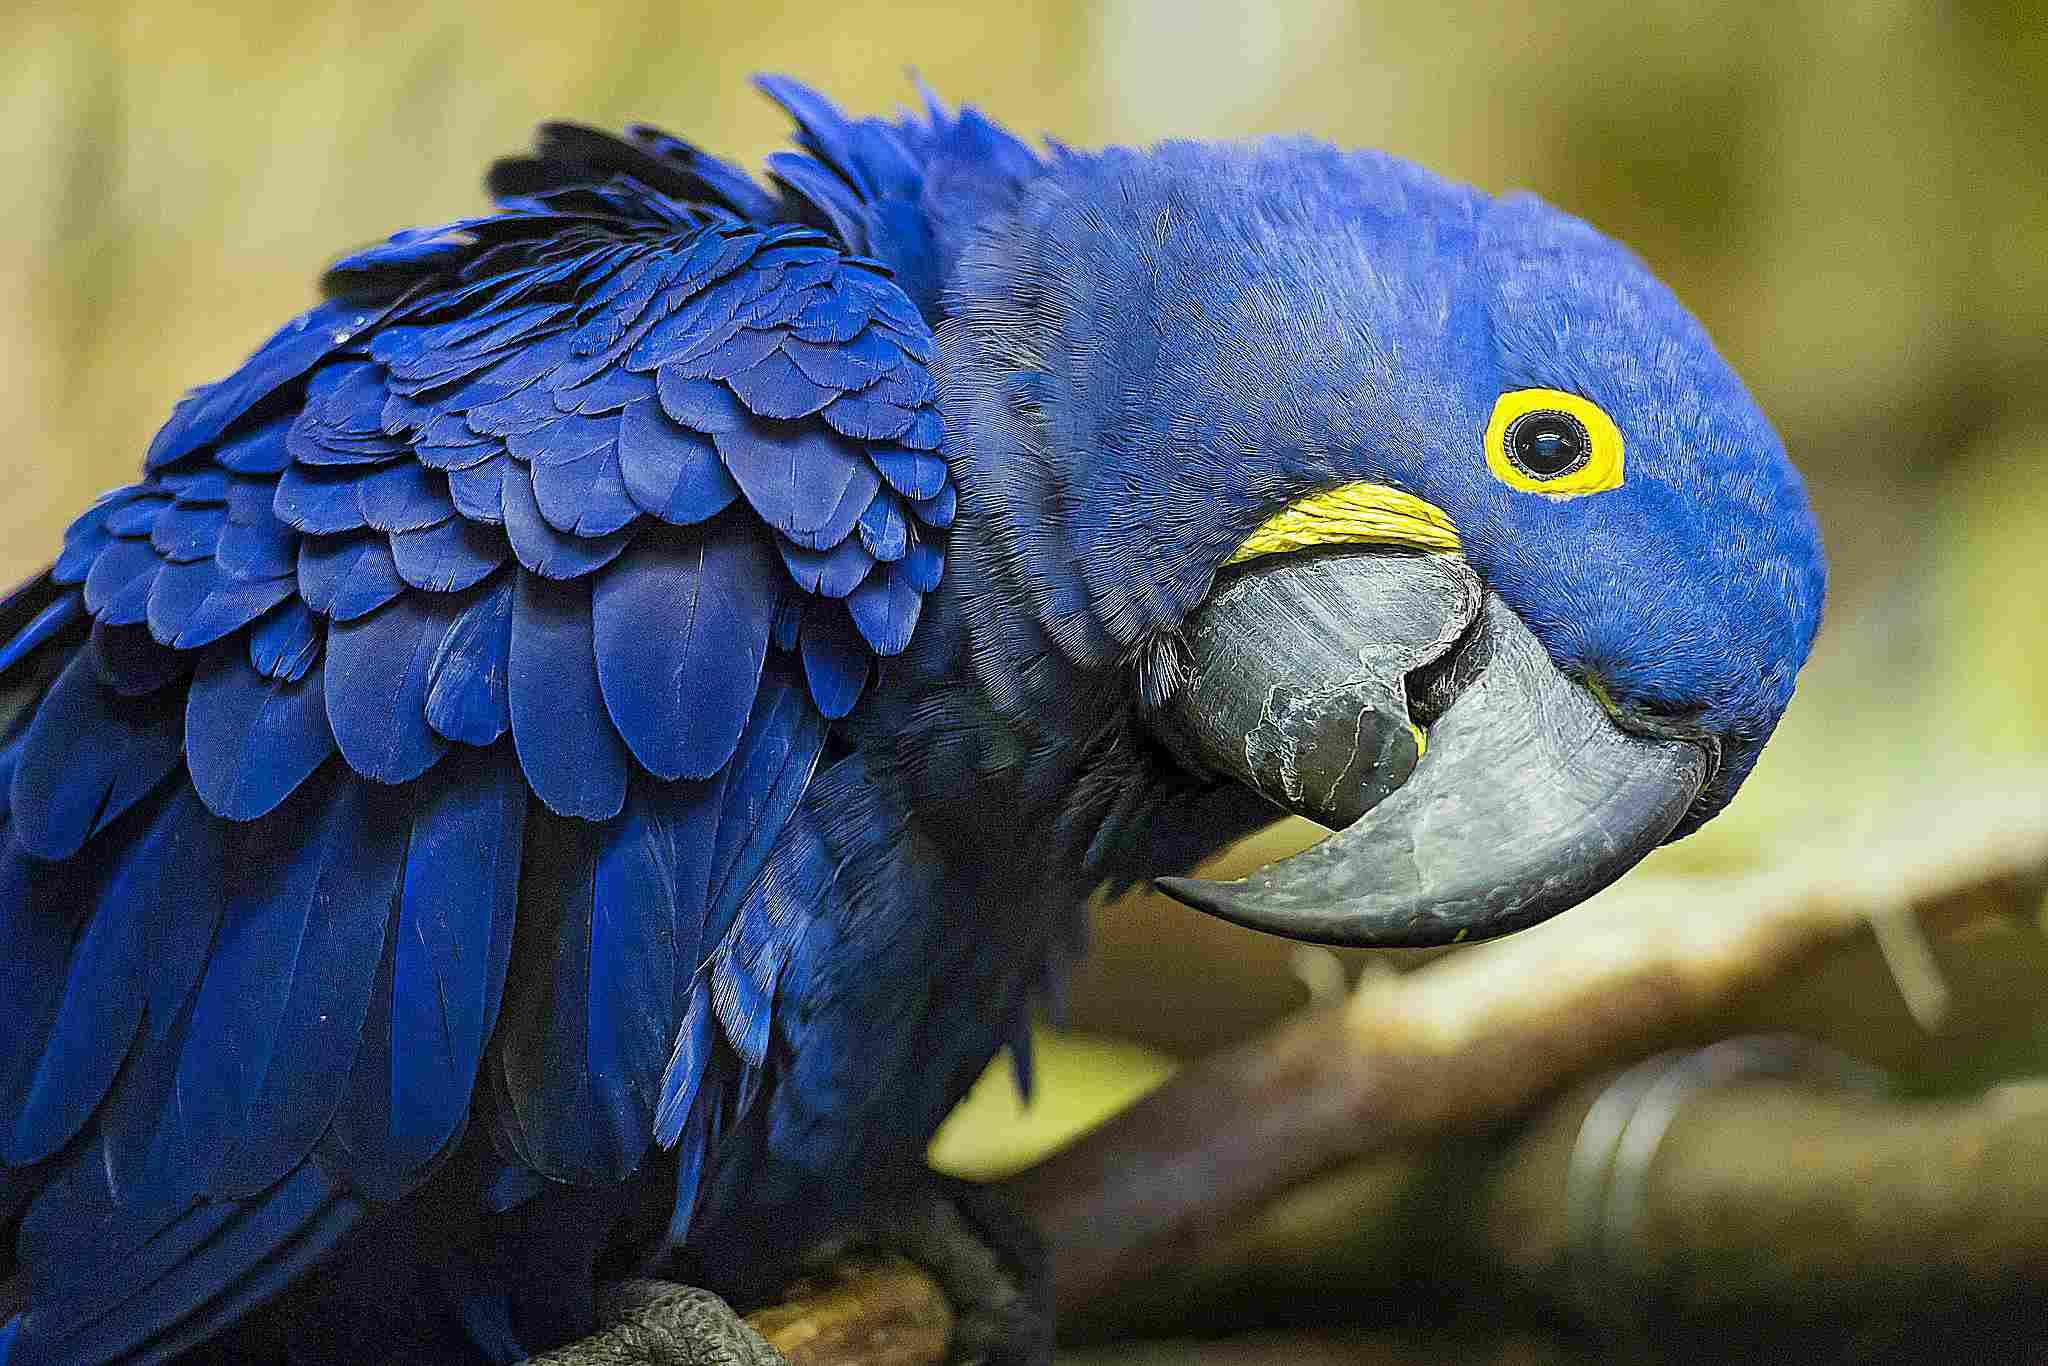 Close-up shot of a hyacinth macaw